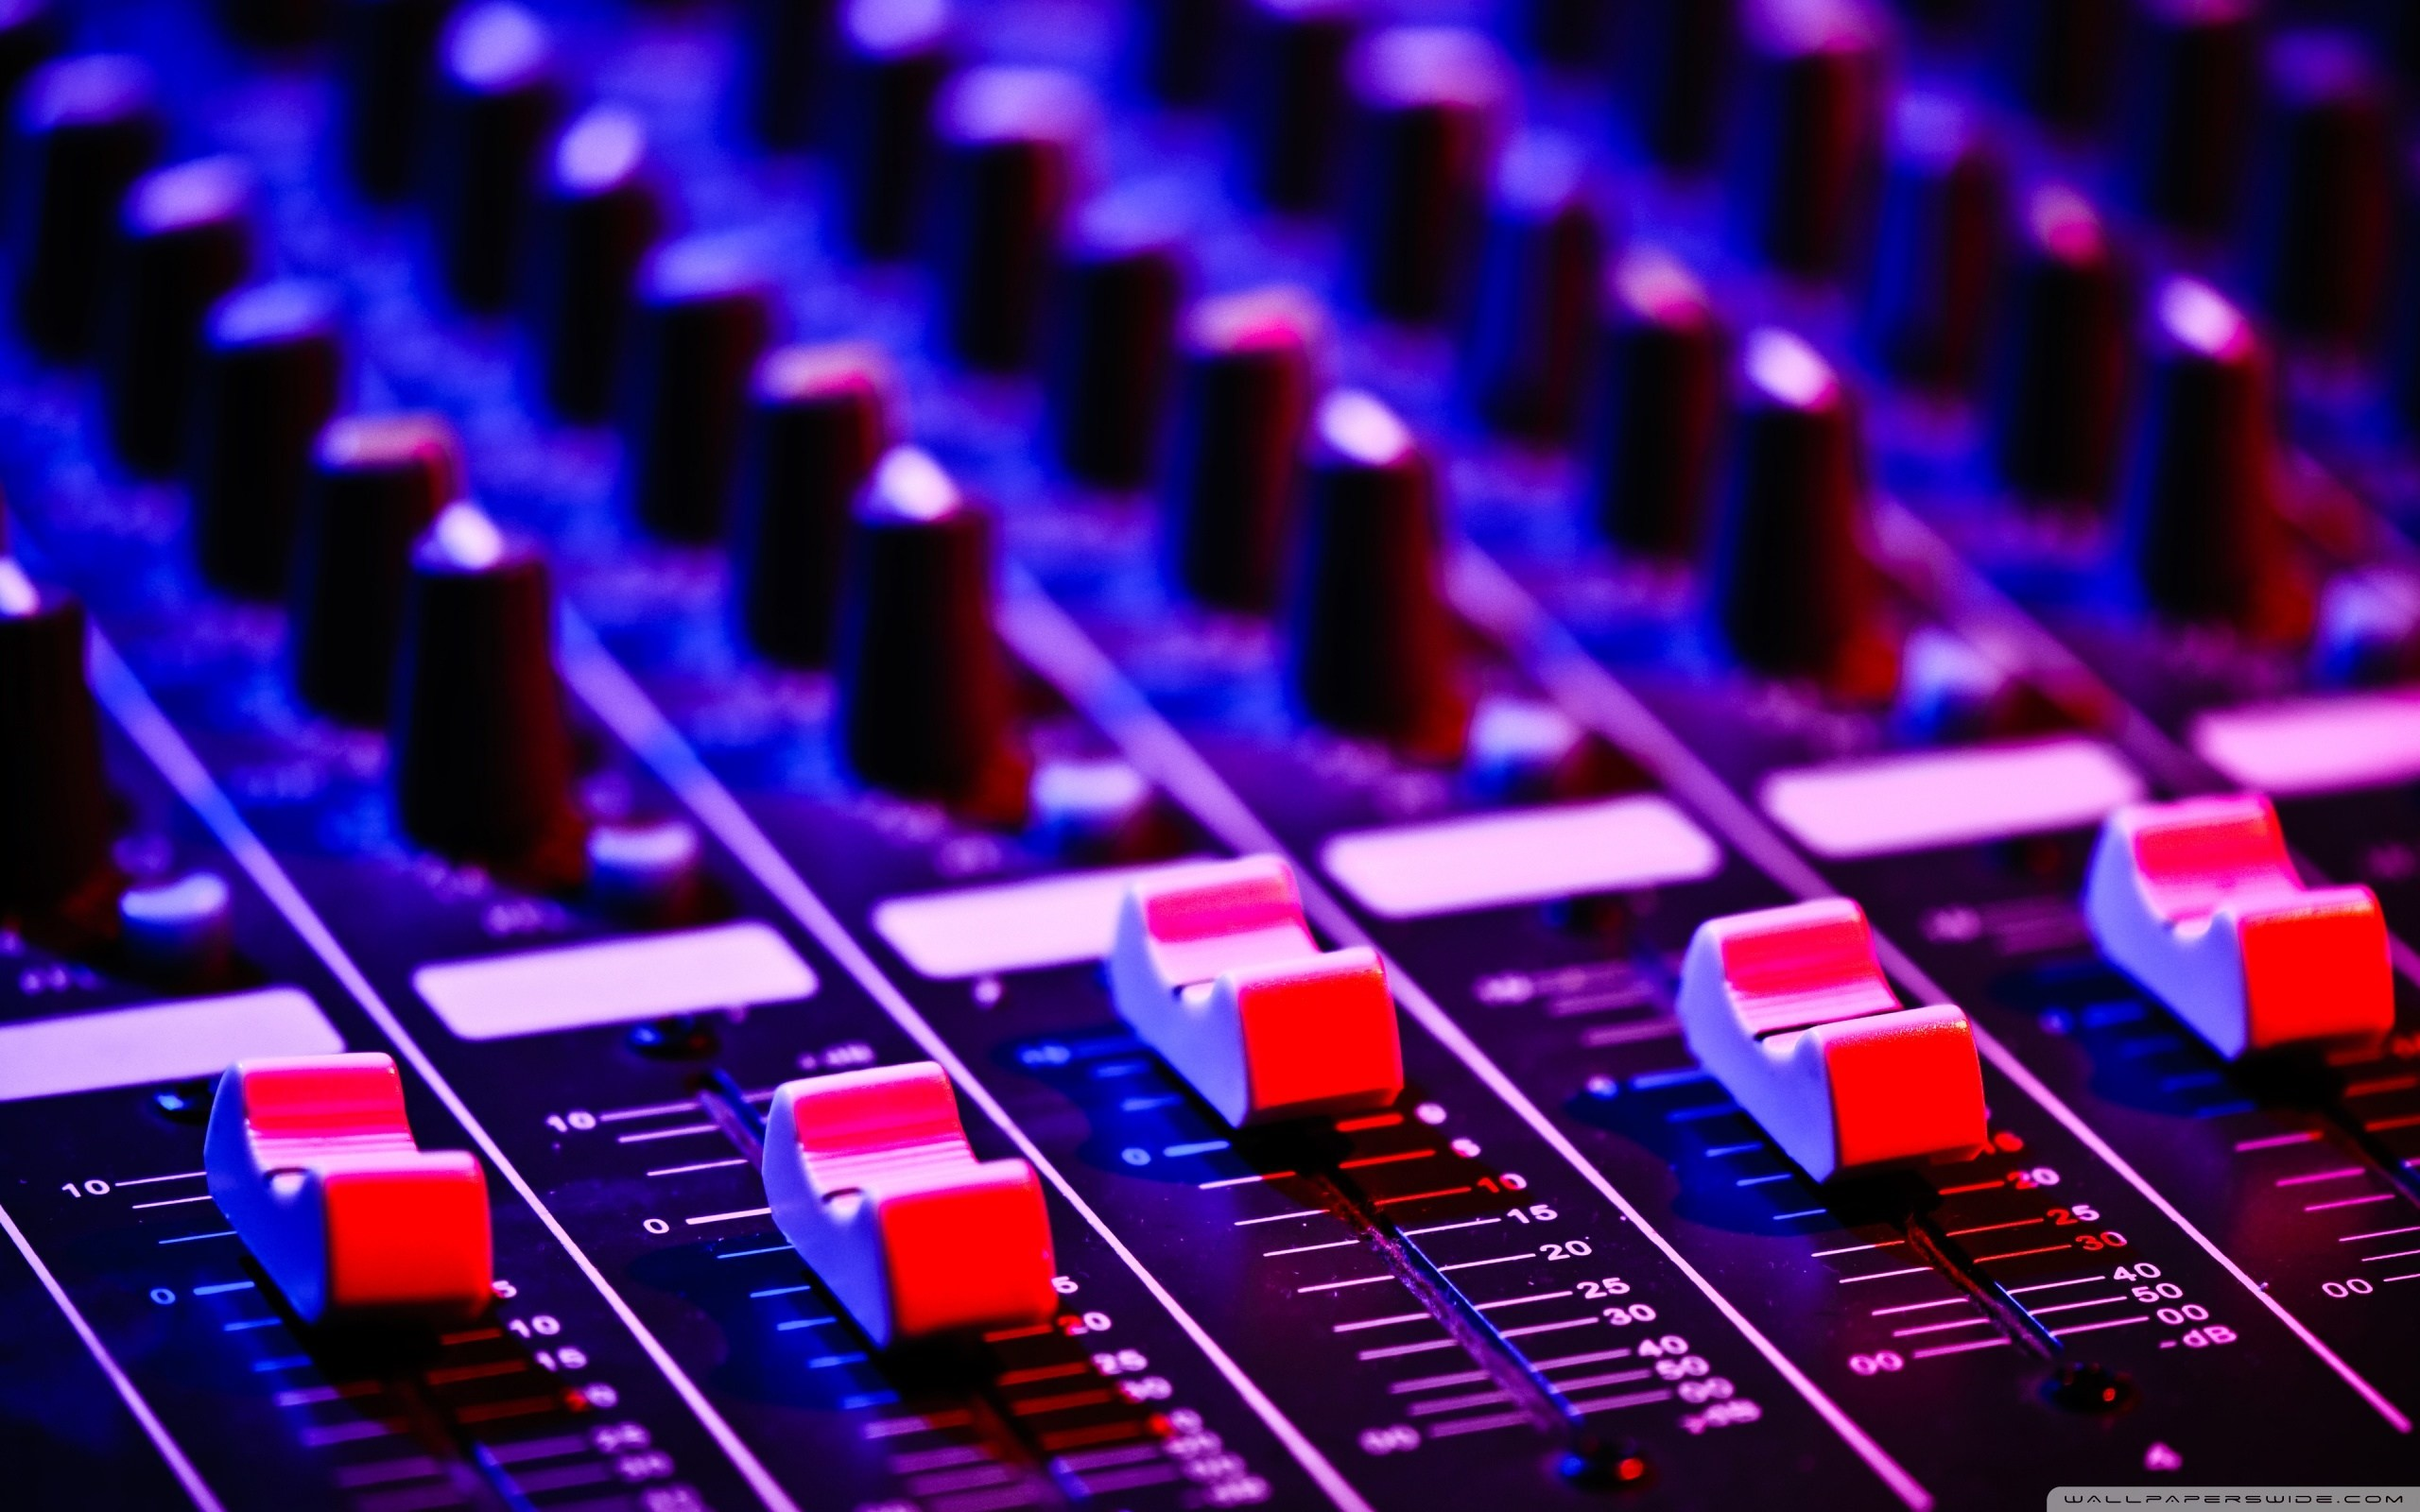 … Wonderful Macbook Hd Wallpaper Live Wallpapers With Sound in Audio Mix  HD Desktop Wallpaper : High